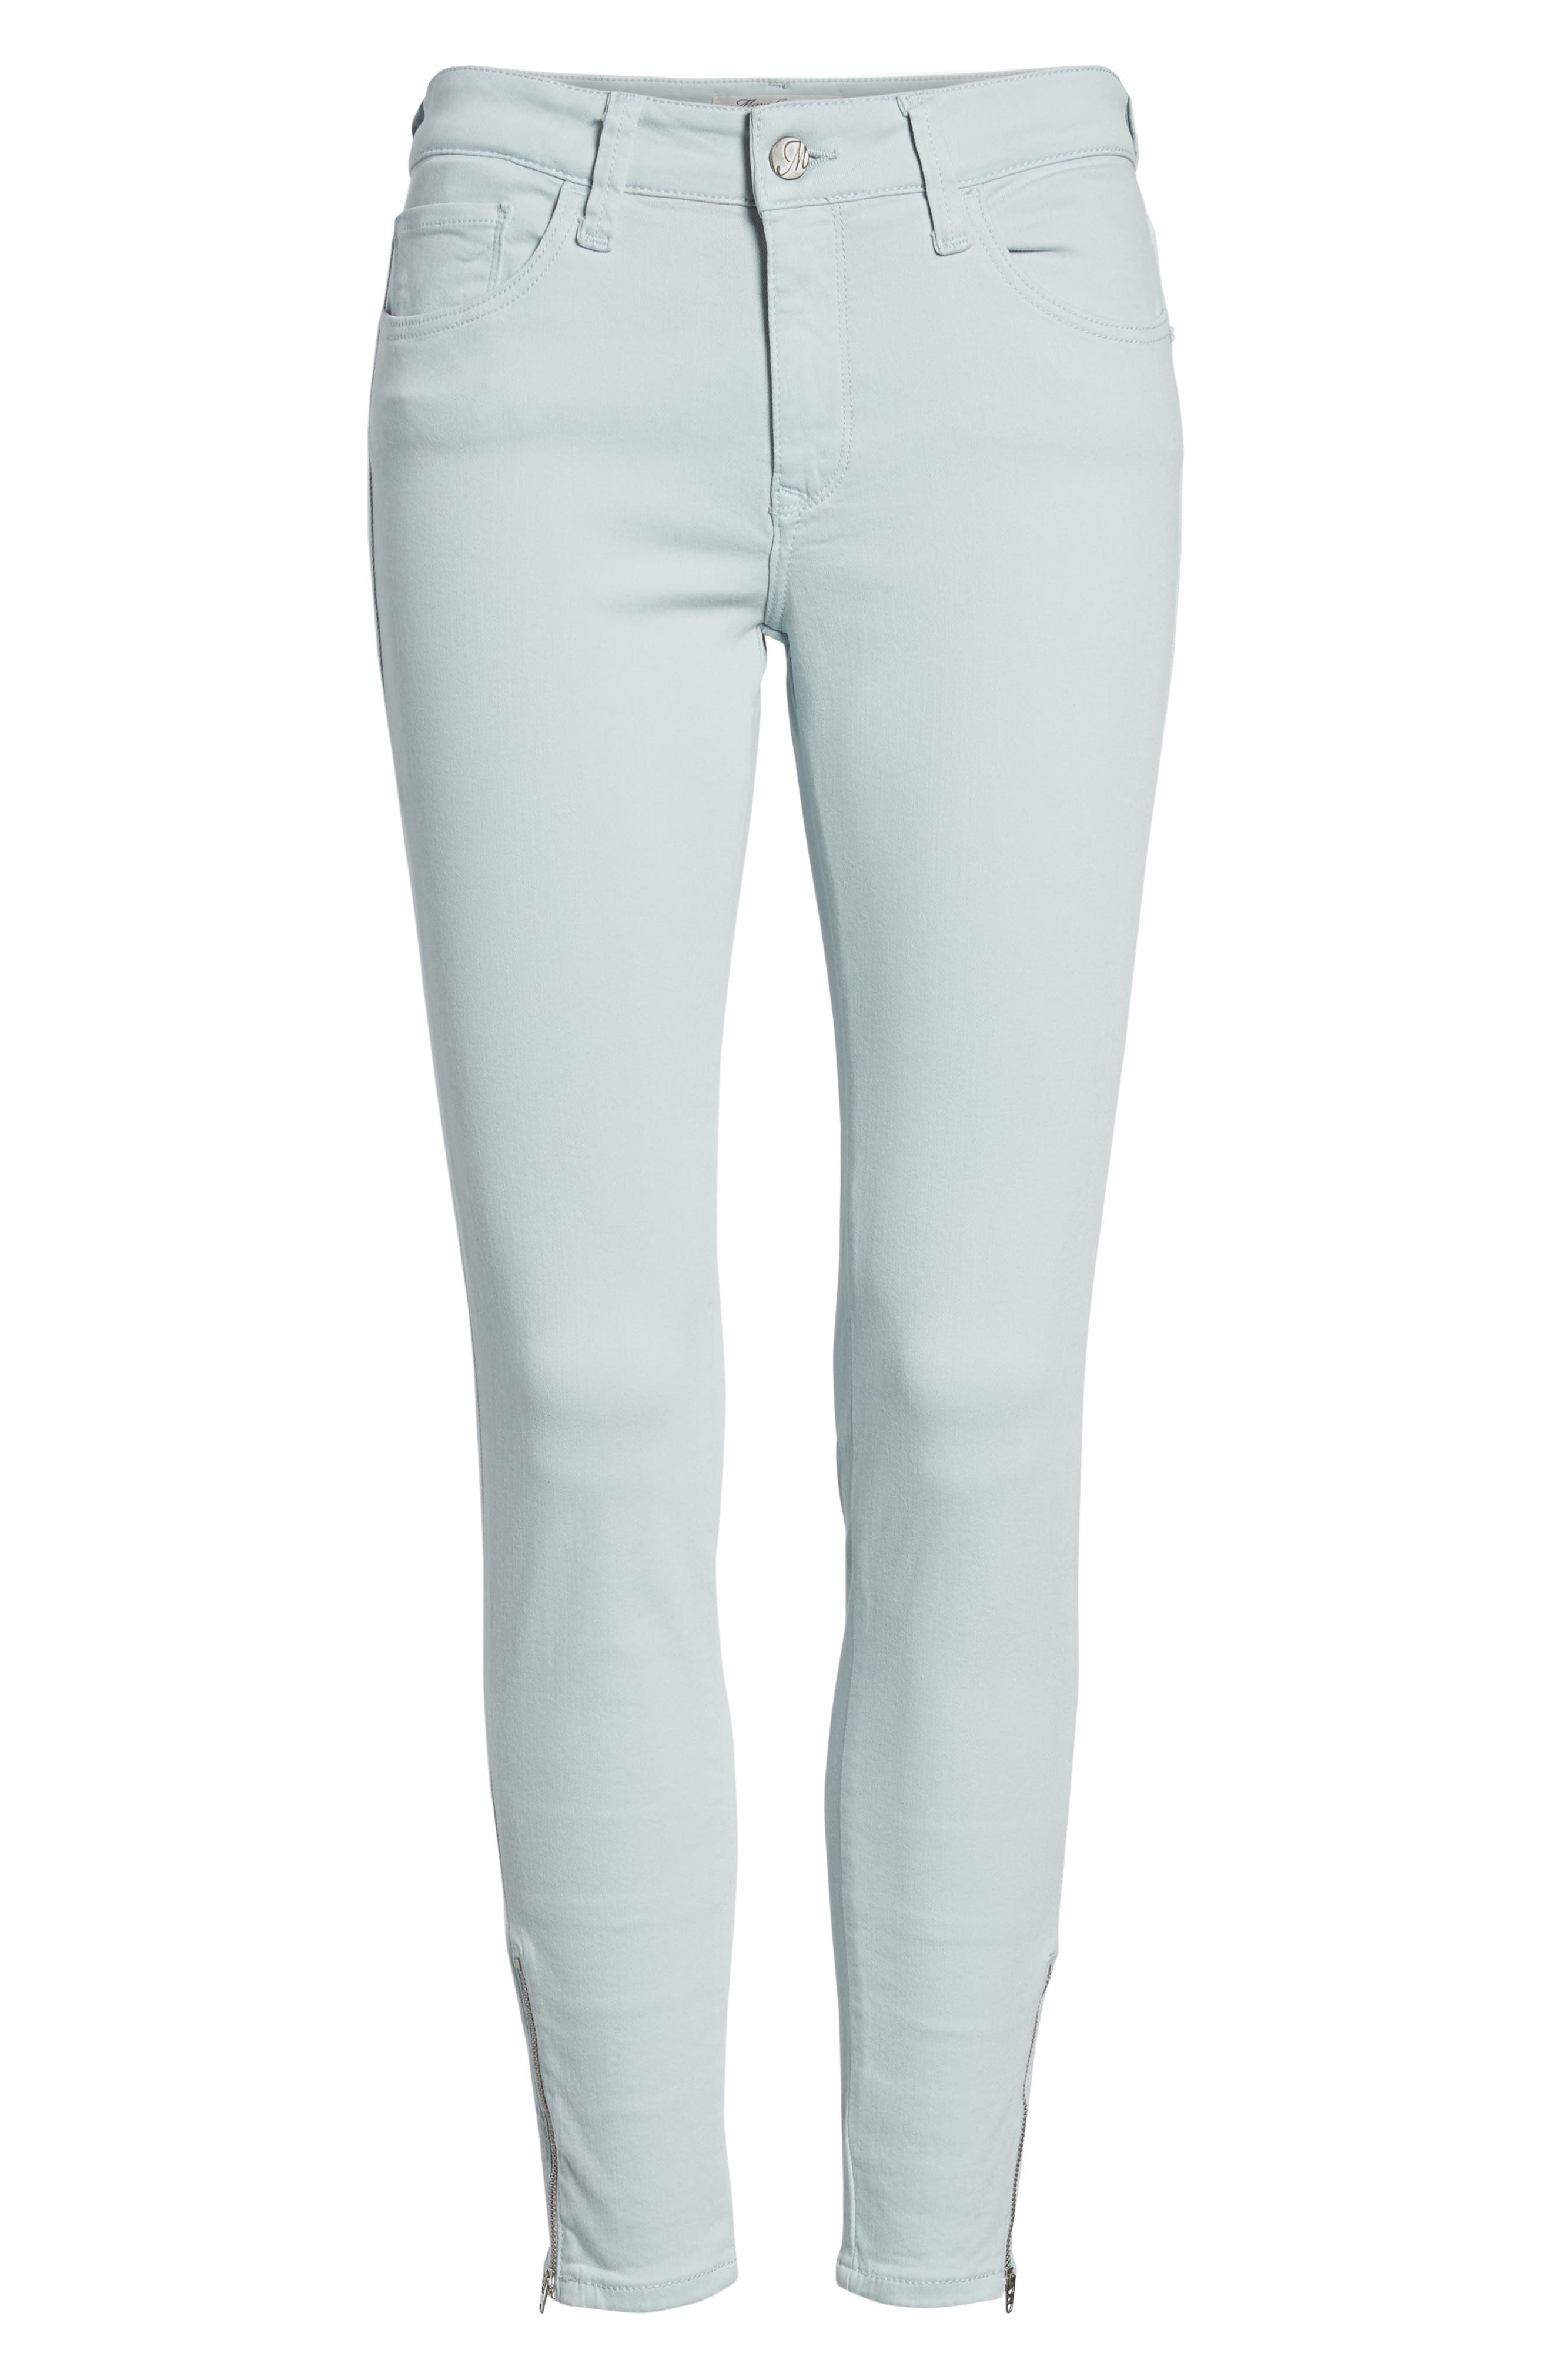 Adriana Zip Ankle Super Skinny Jeans,                             Alternate thumbnail 7, color,                             Zip Slate Twill